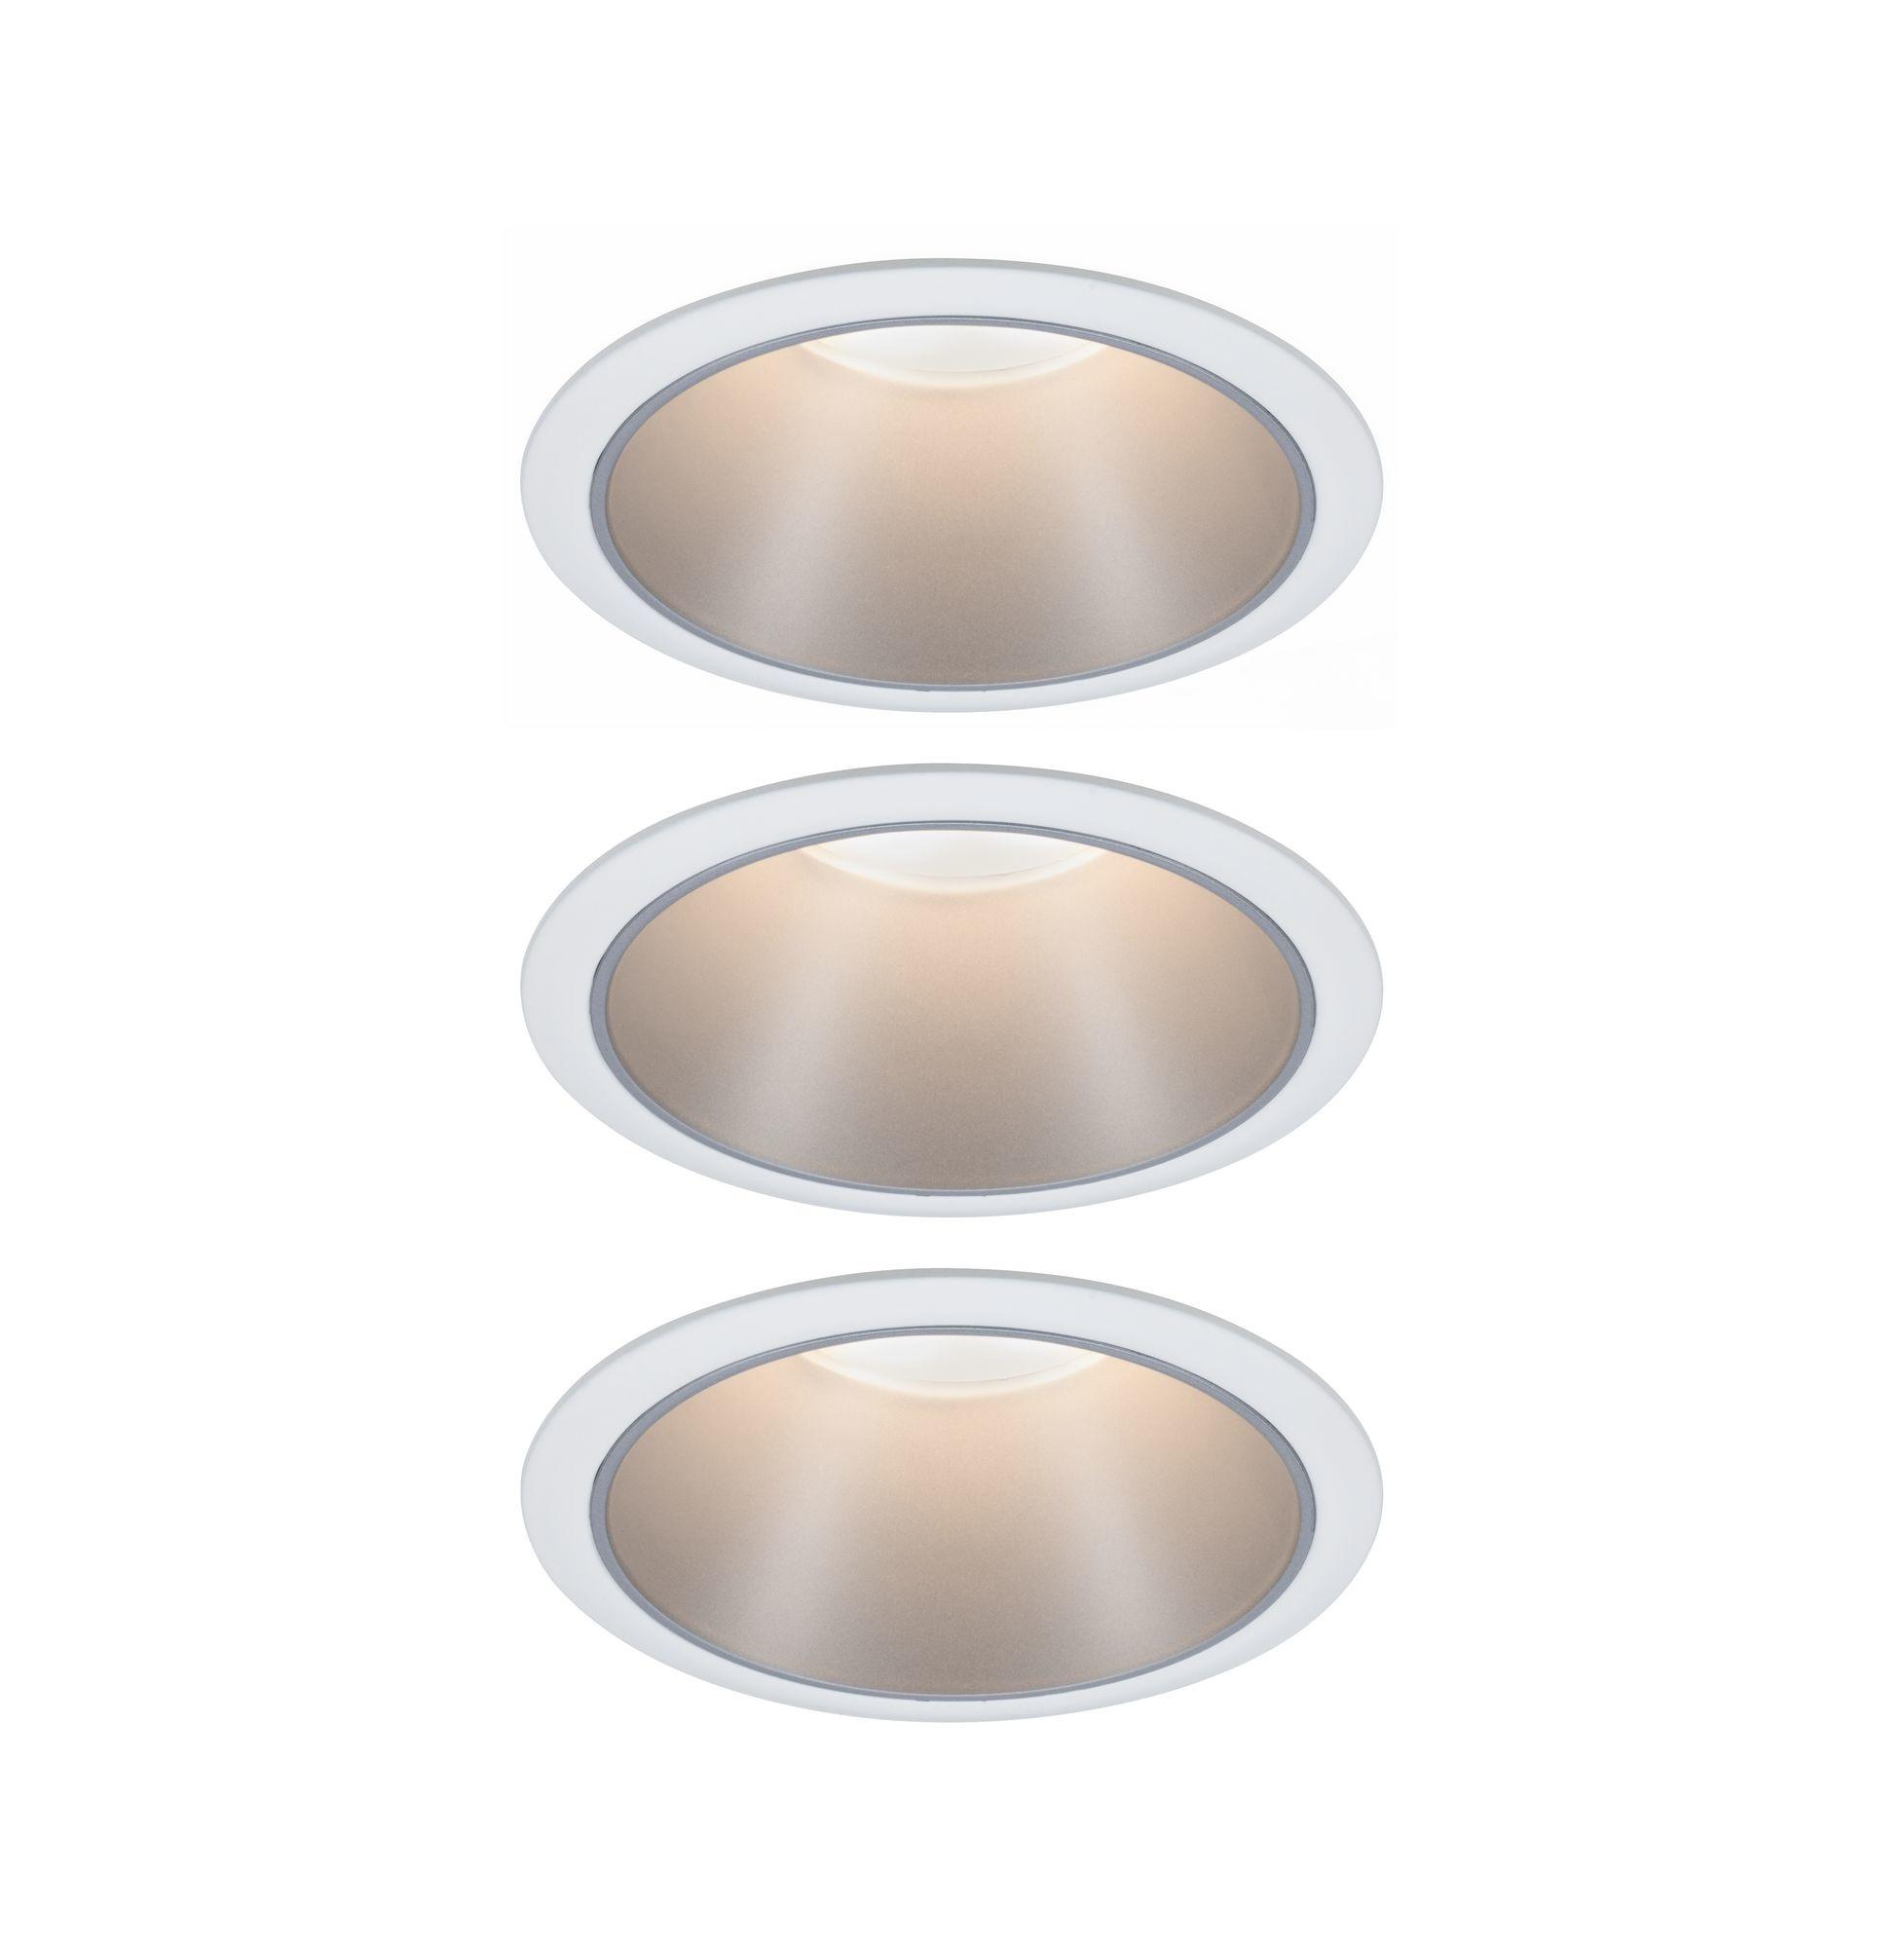 Paulmann EBL Set Cole Coin 3StepDim rd starr LED 3x6,5W 2700K 230V weiß/silber matt/Kst